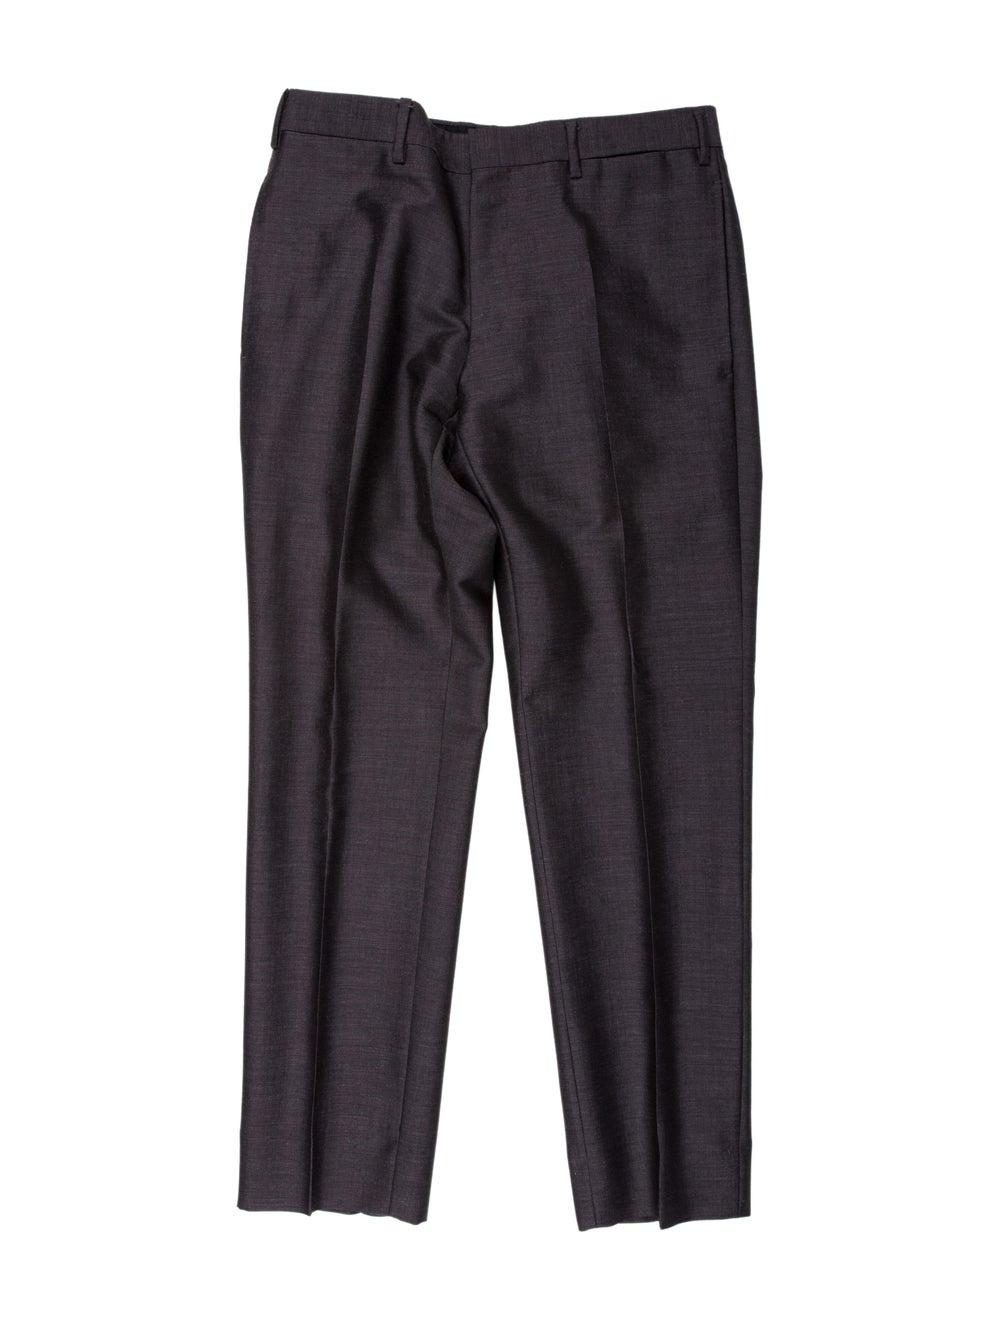 Prada Mohair Two-Piece Suit Grey - image 3